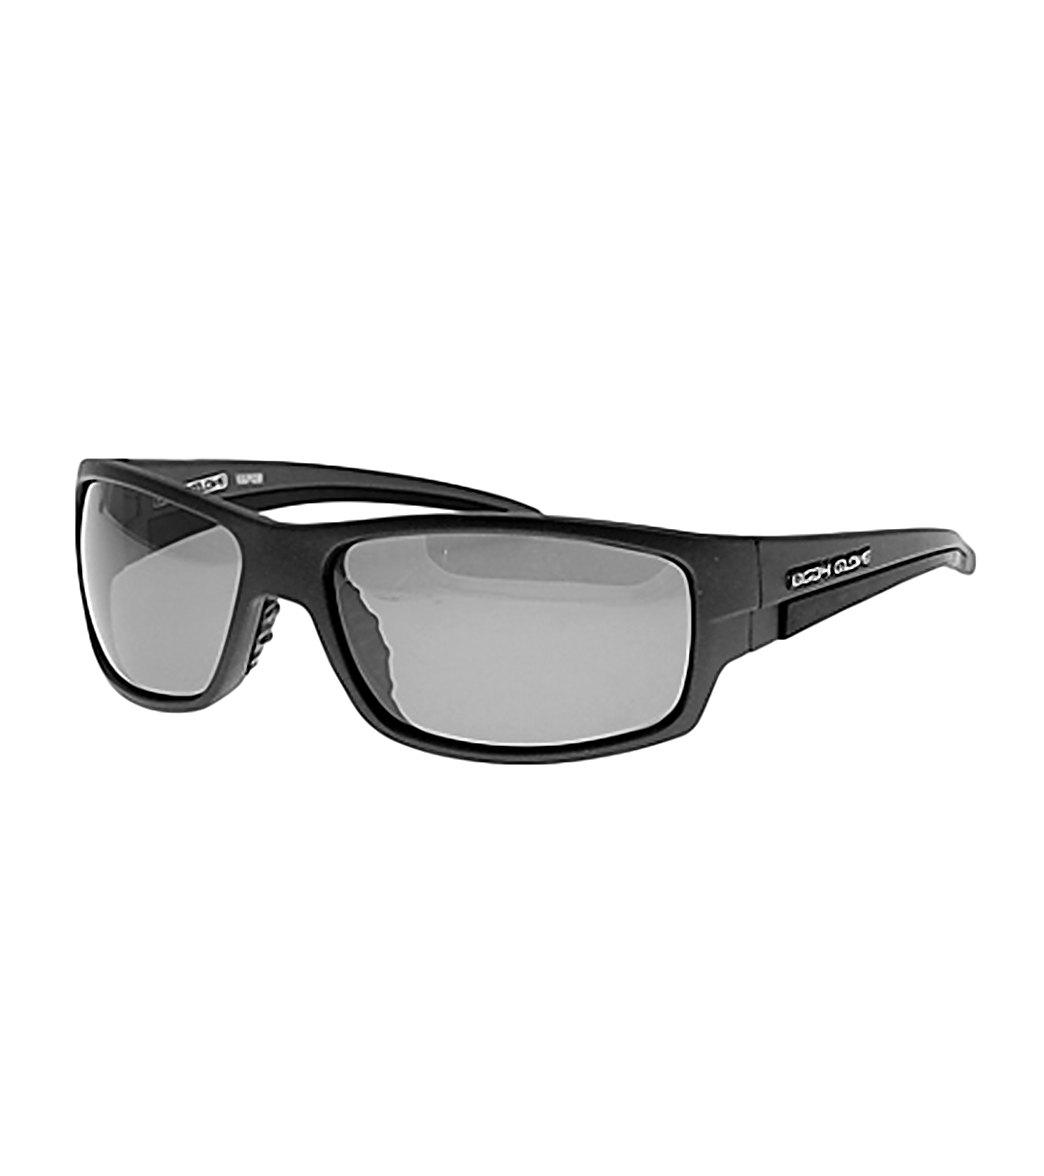 bcde4000f6 Body Glove Vapor 1 Polarized Sunglasses at SwimOutlet.com